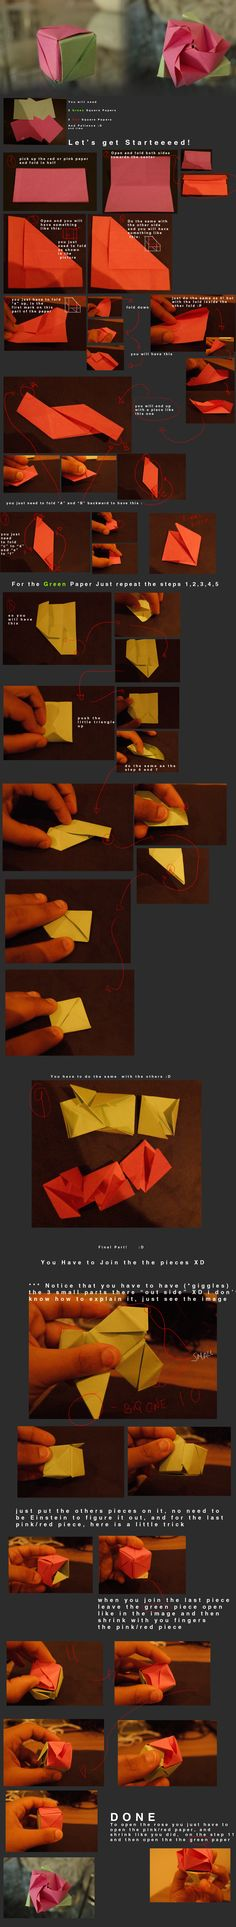 magic_box_origami_by_carlosarthur-d5kzurd.png (1016×8300)